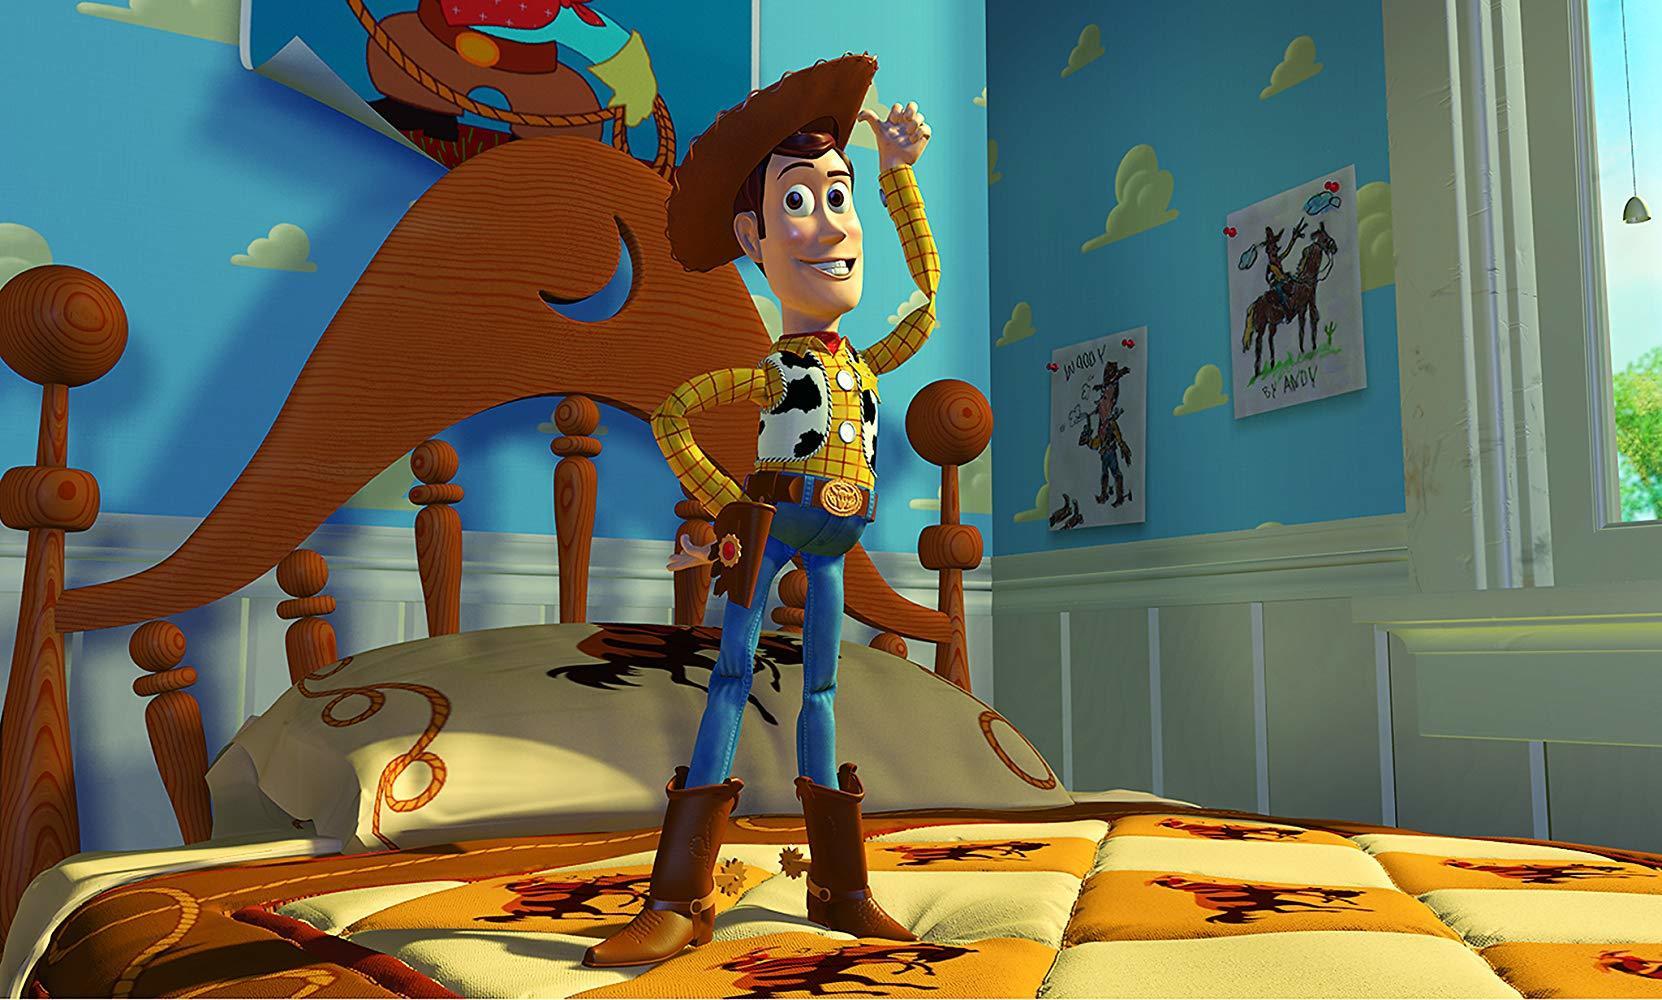 Toy Story 3 [Filmoteca]